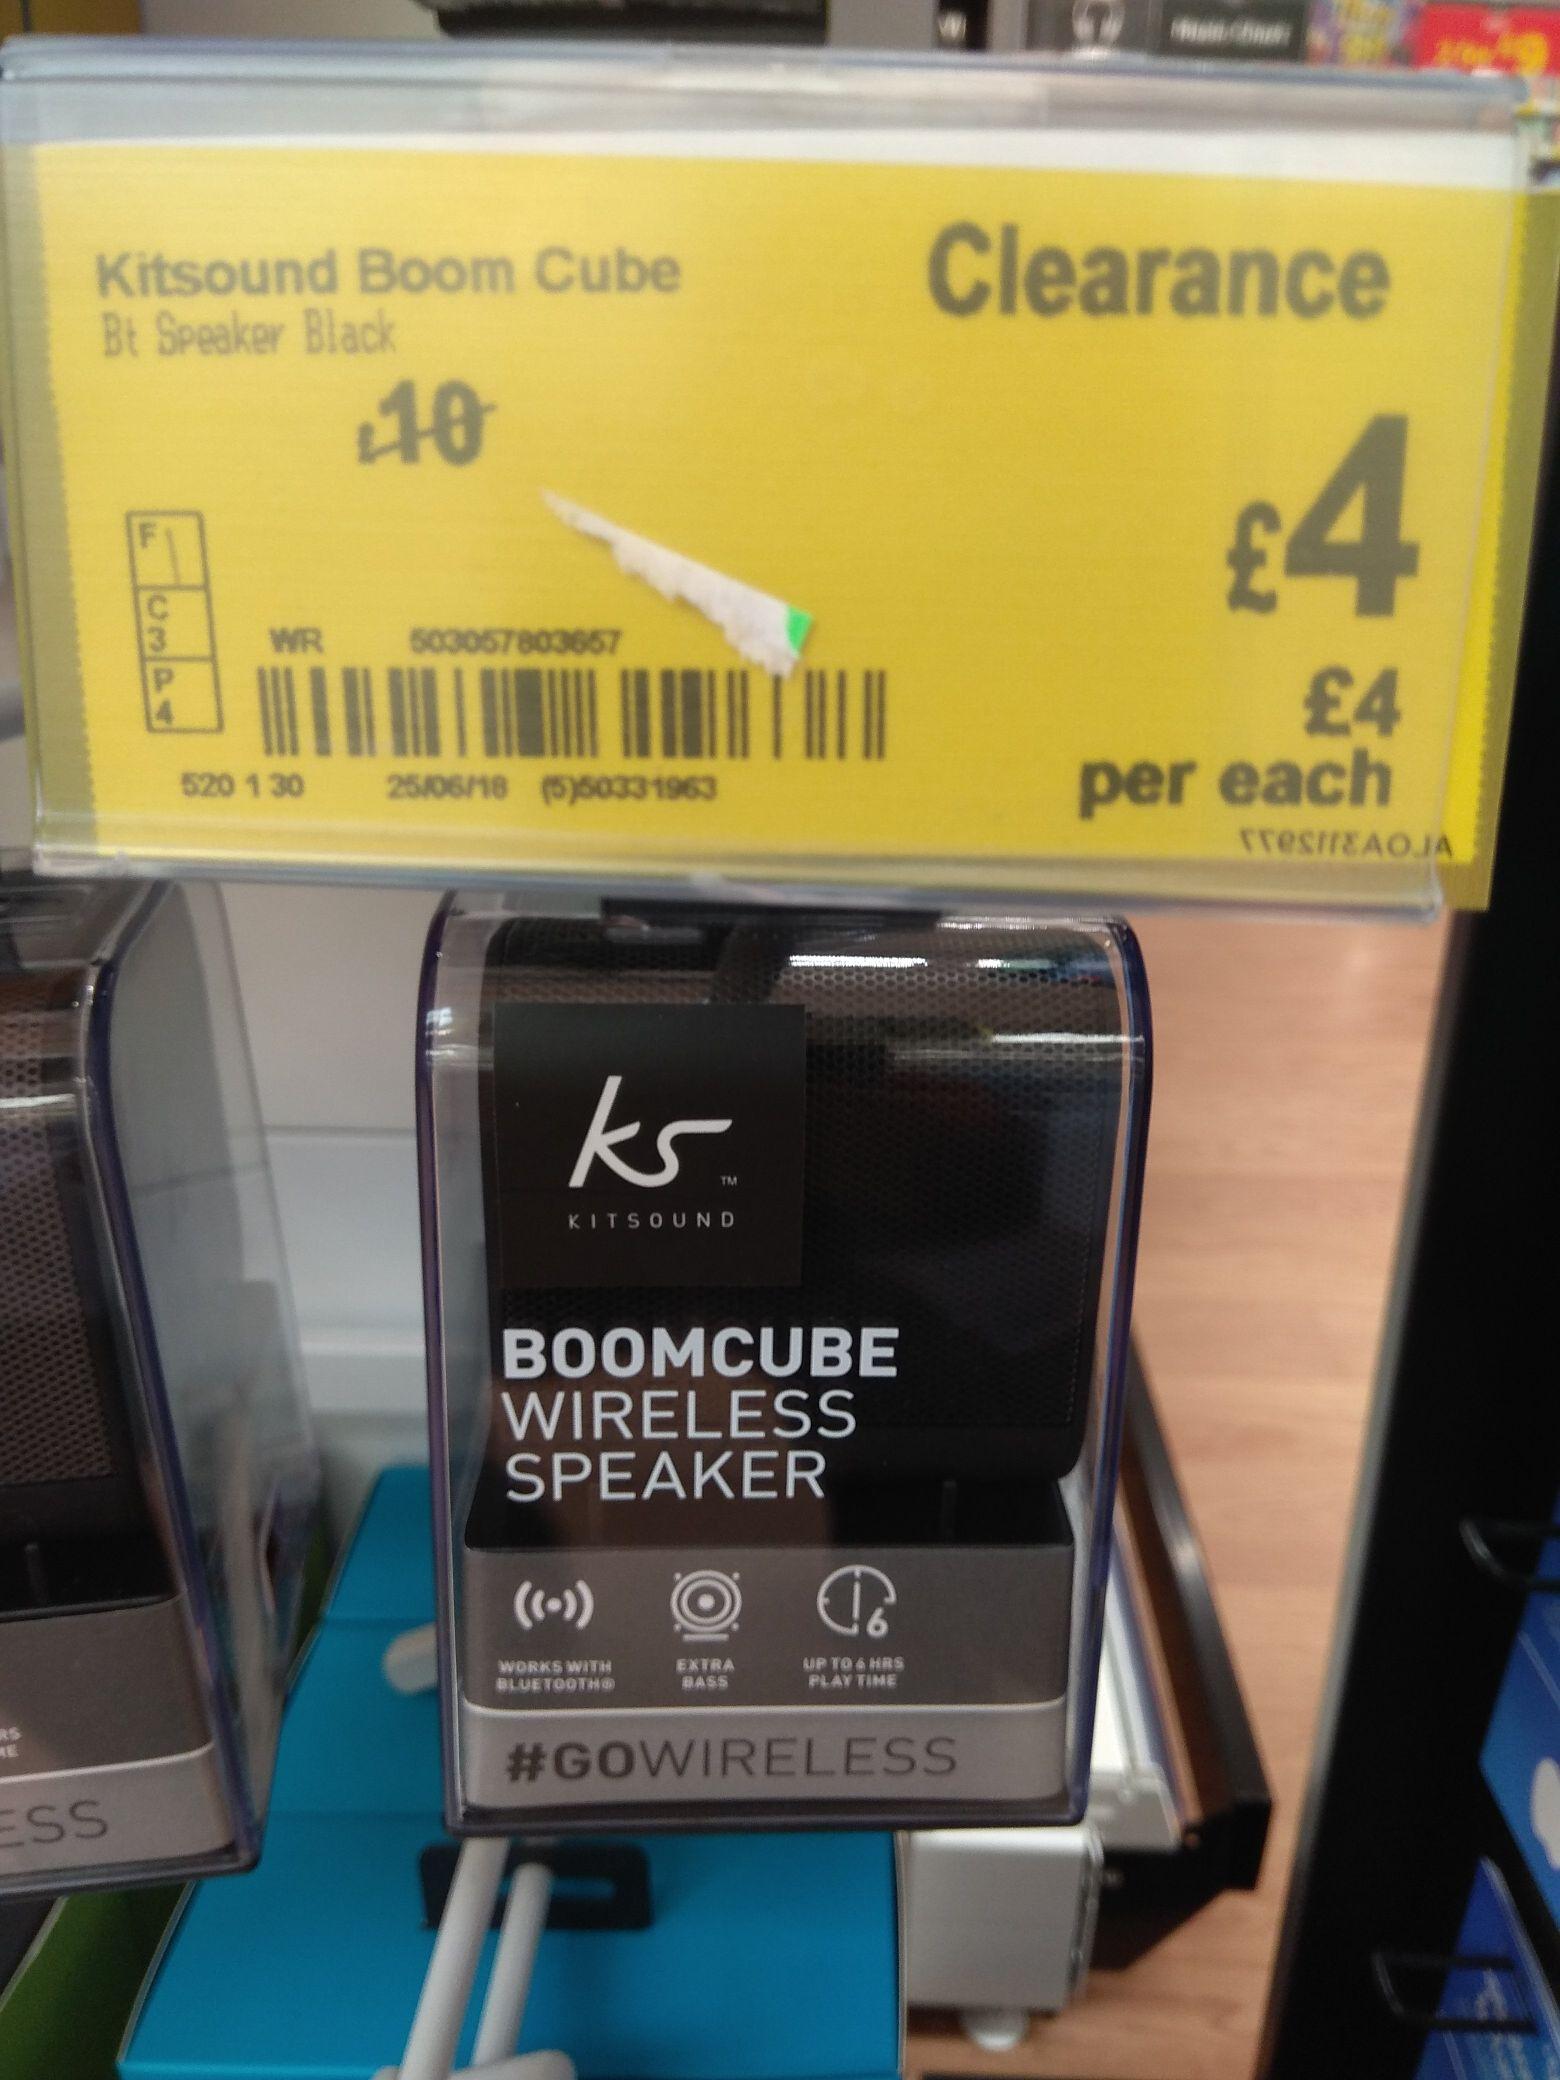 KitSound Boom Cube Portable Wireless Bluetooth Speaker - Black - £4 instore @ Asda living